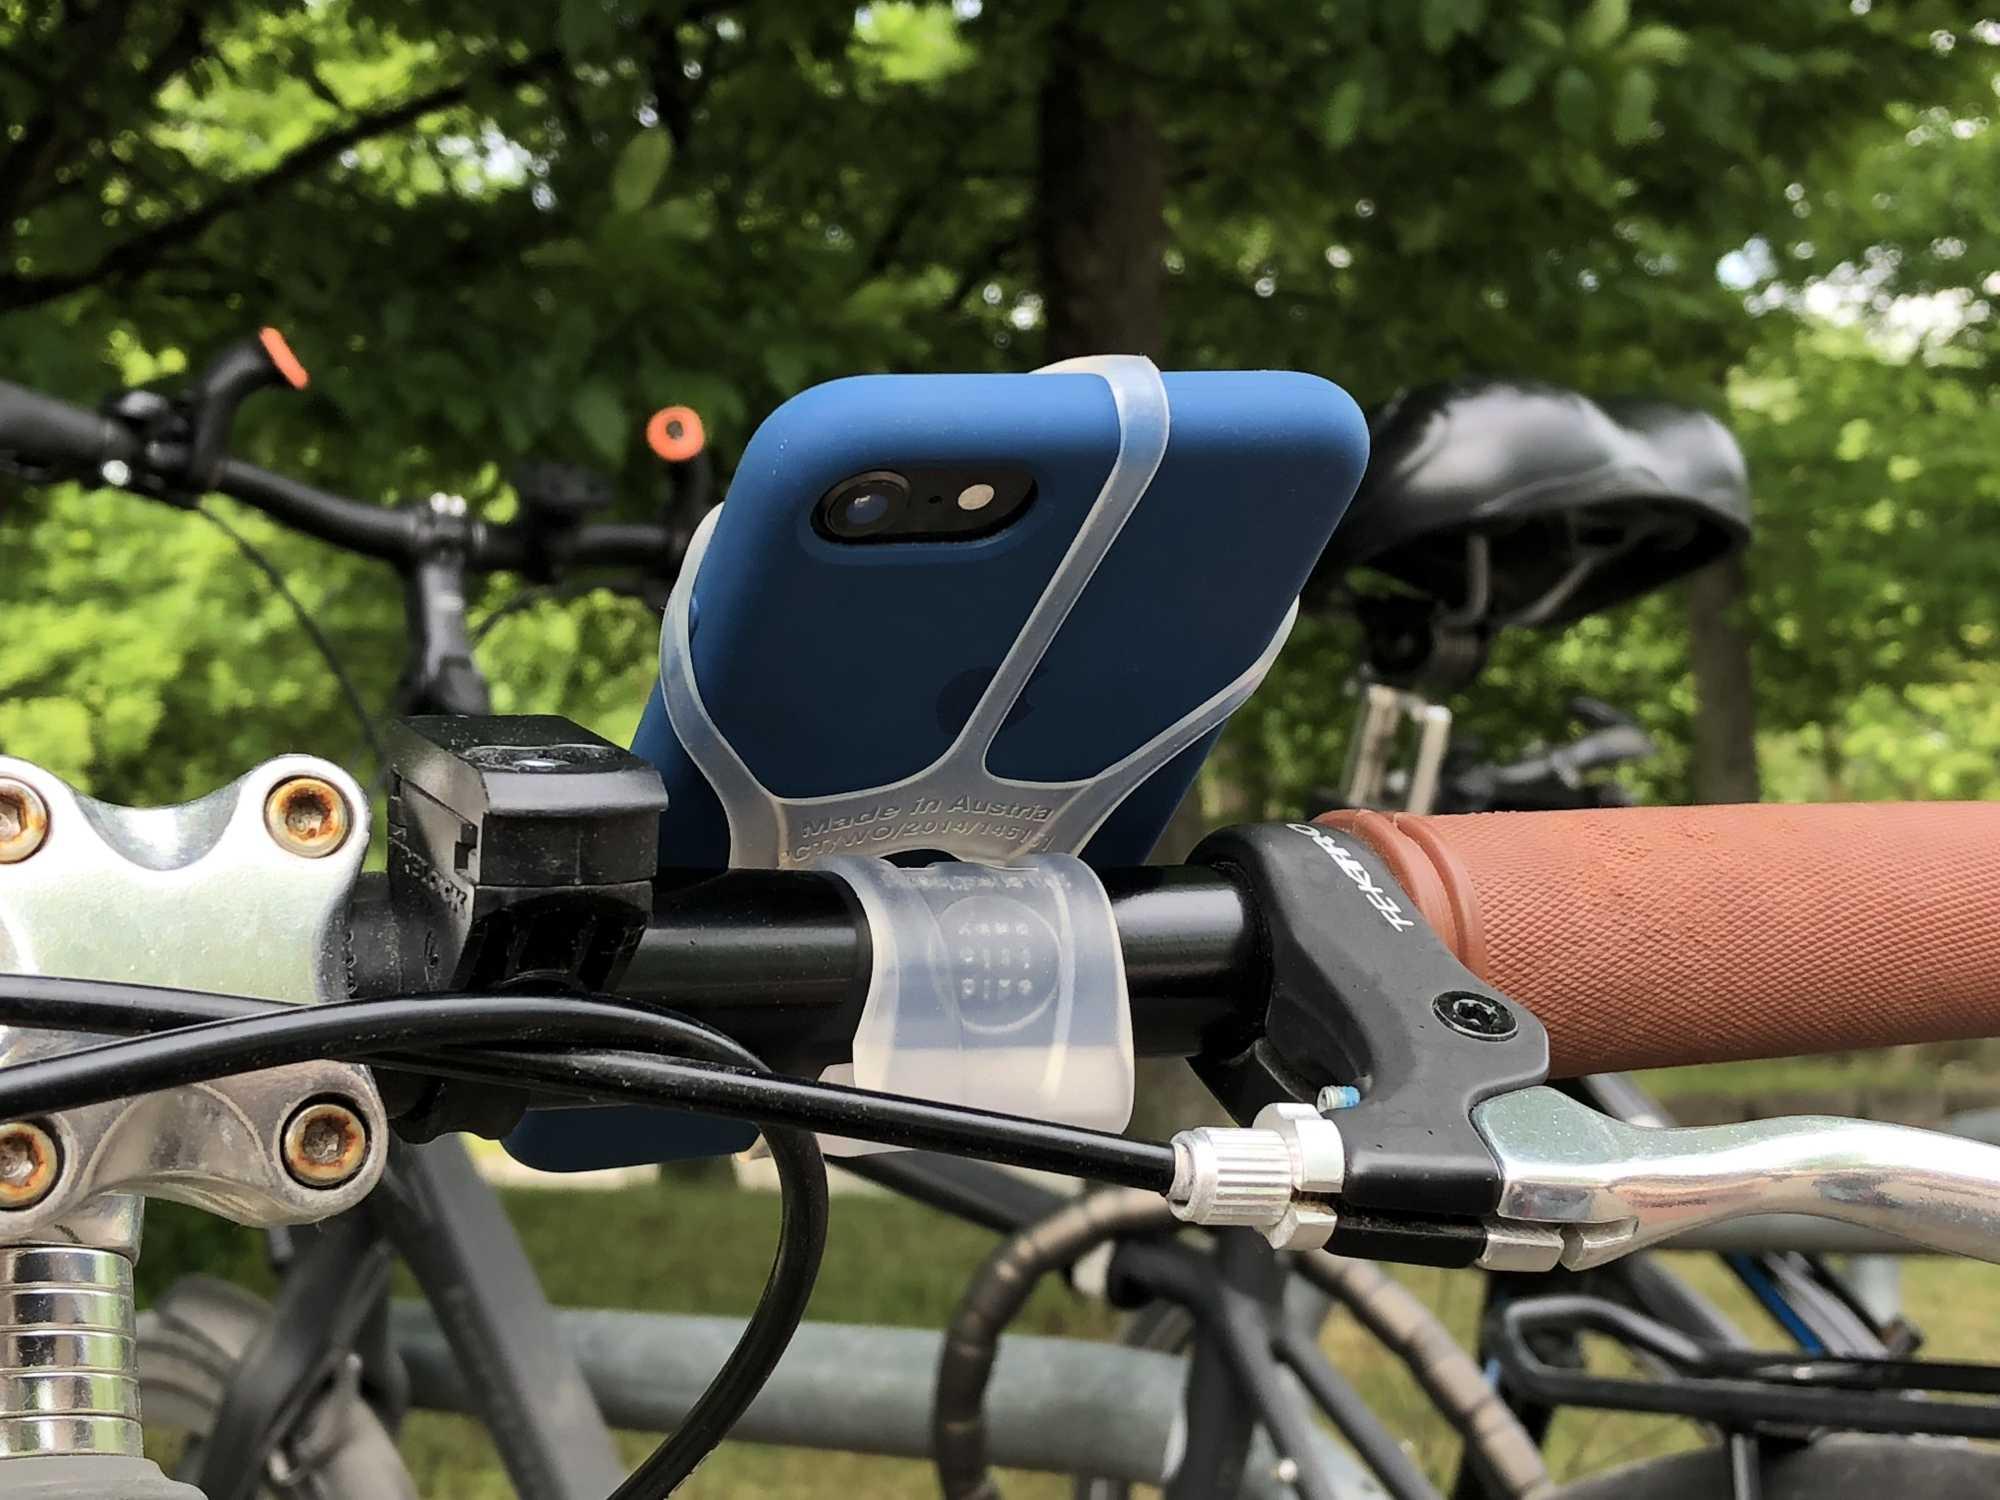 Finn mit iPhone am Fahrrad